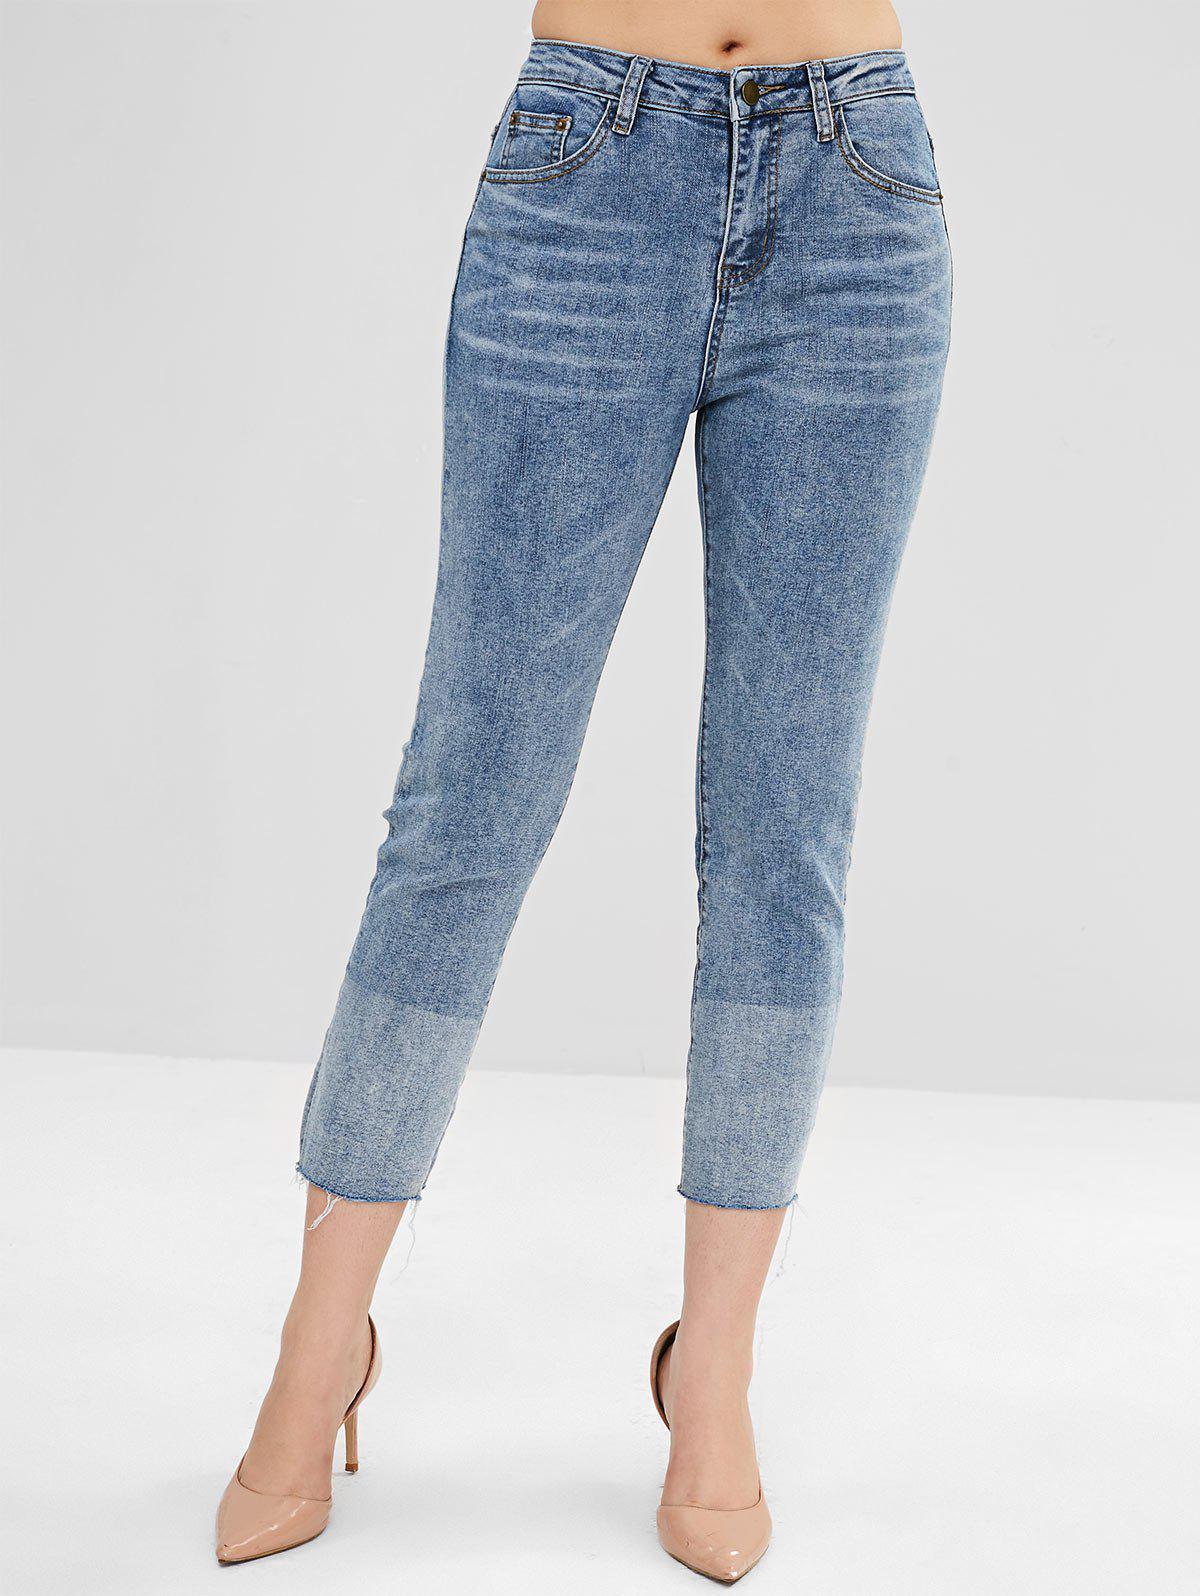 Zipper Fly Ombre Jeans 291787002